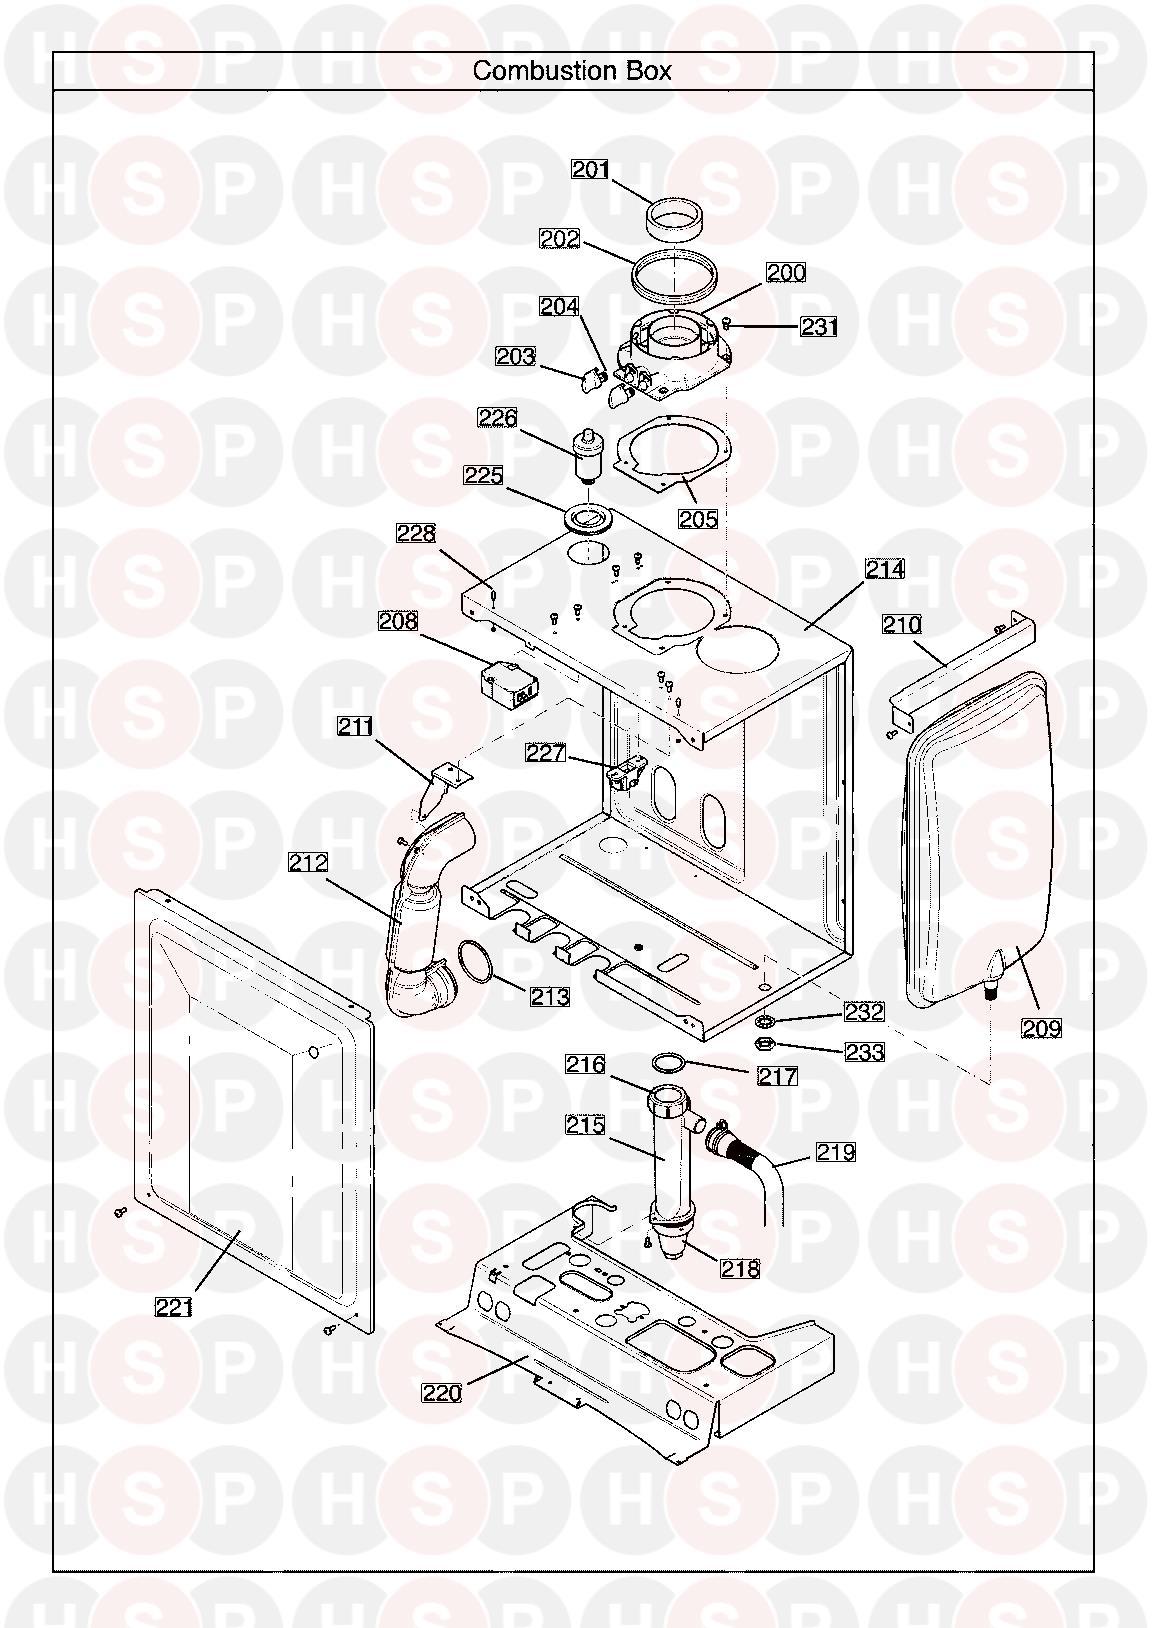 Main 24 SYSTEM ECO ELITE Appliance Diagram (COMBUSTION BOX